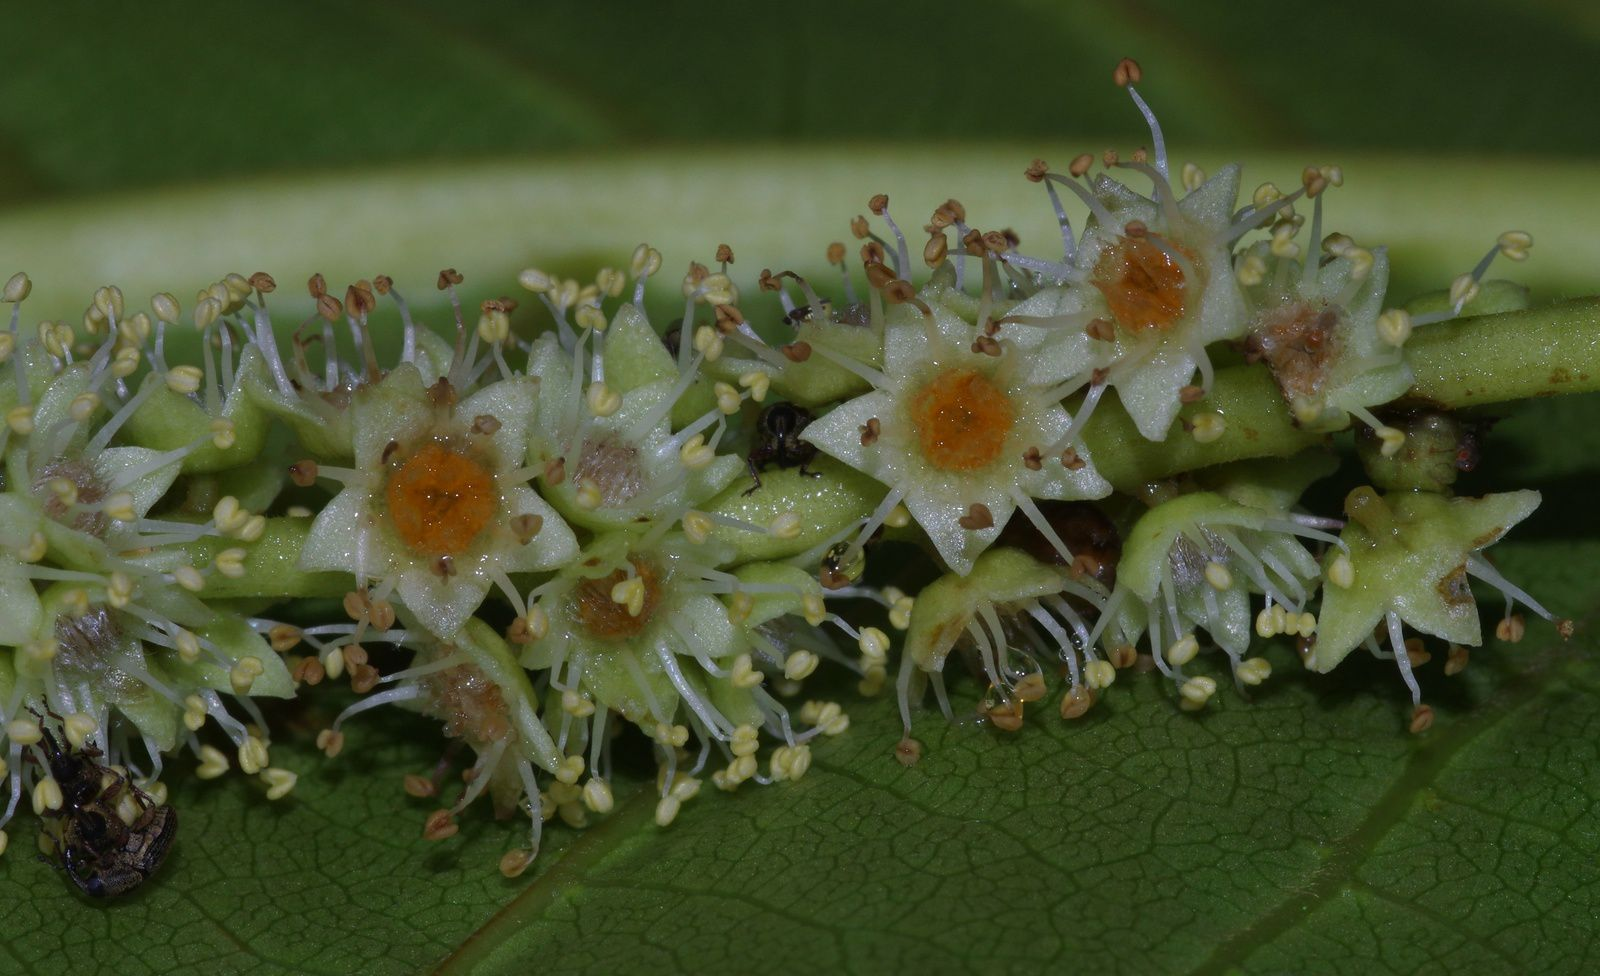 Terminalia catappa (amandier-plage, badamier)